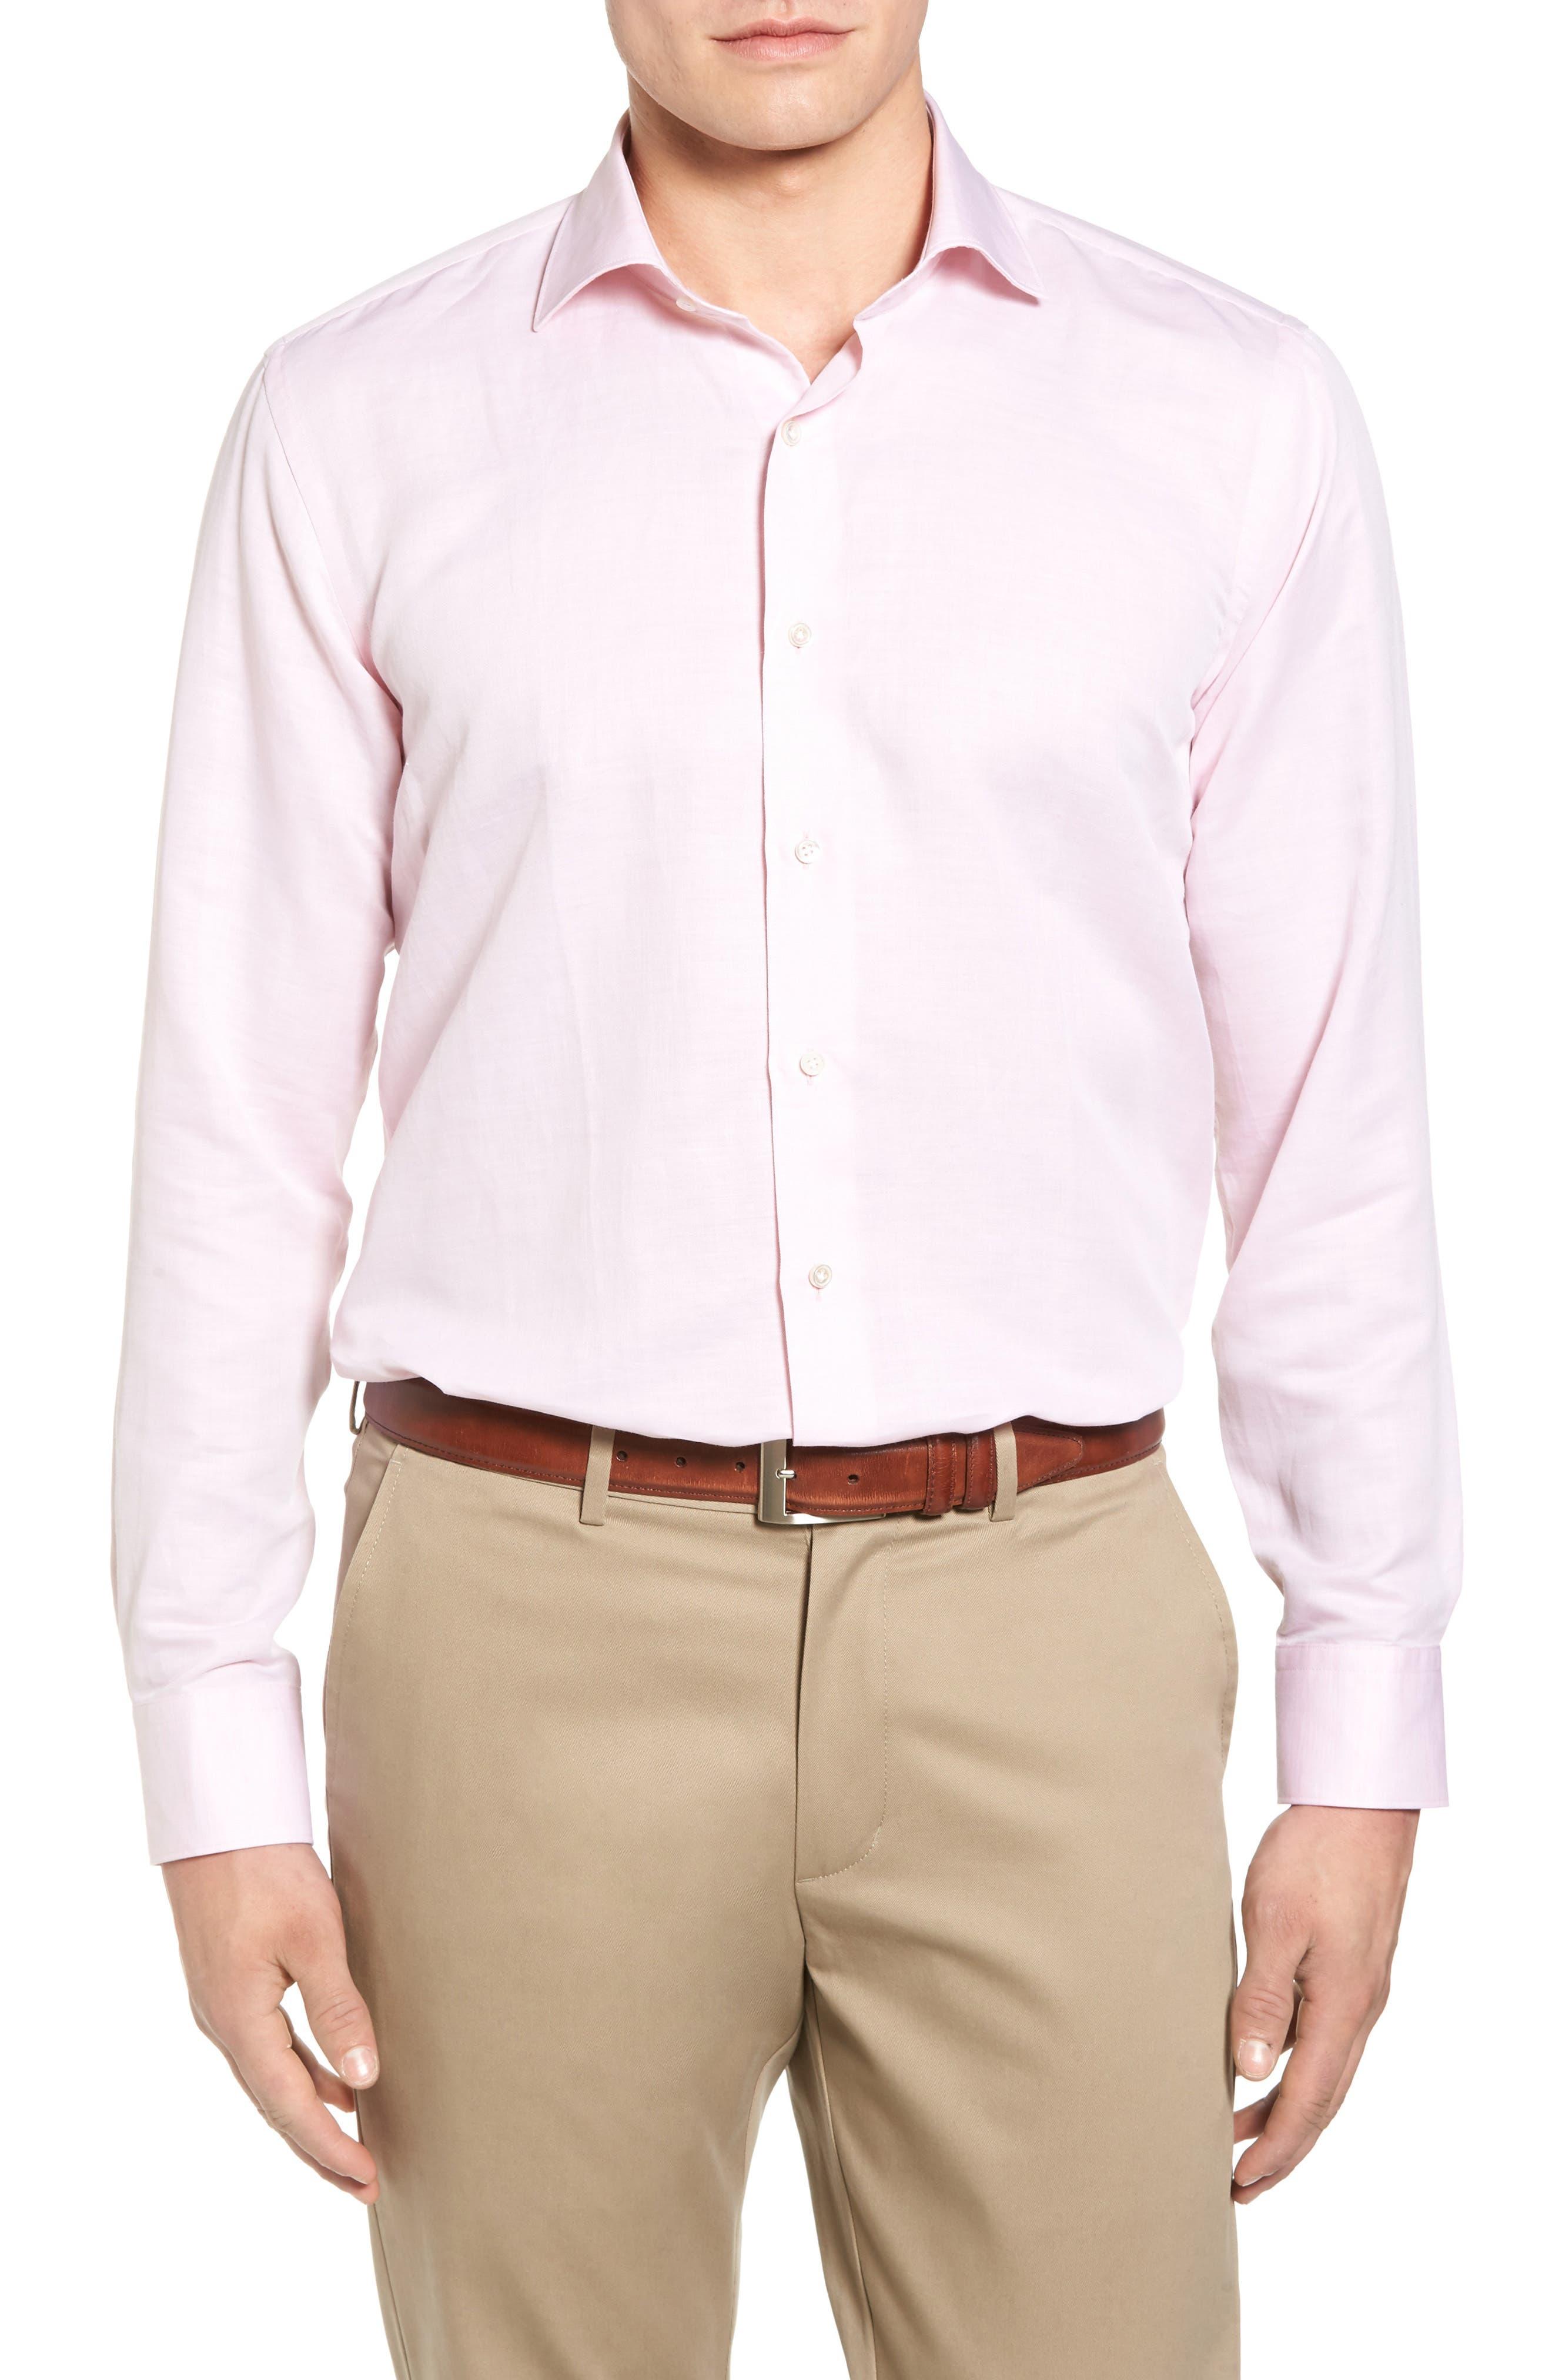 Alternate Image 1 Selected - Peter Millar Collection Linen & Cotton Sport Shirt